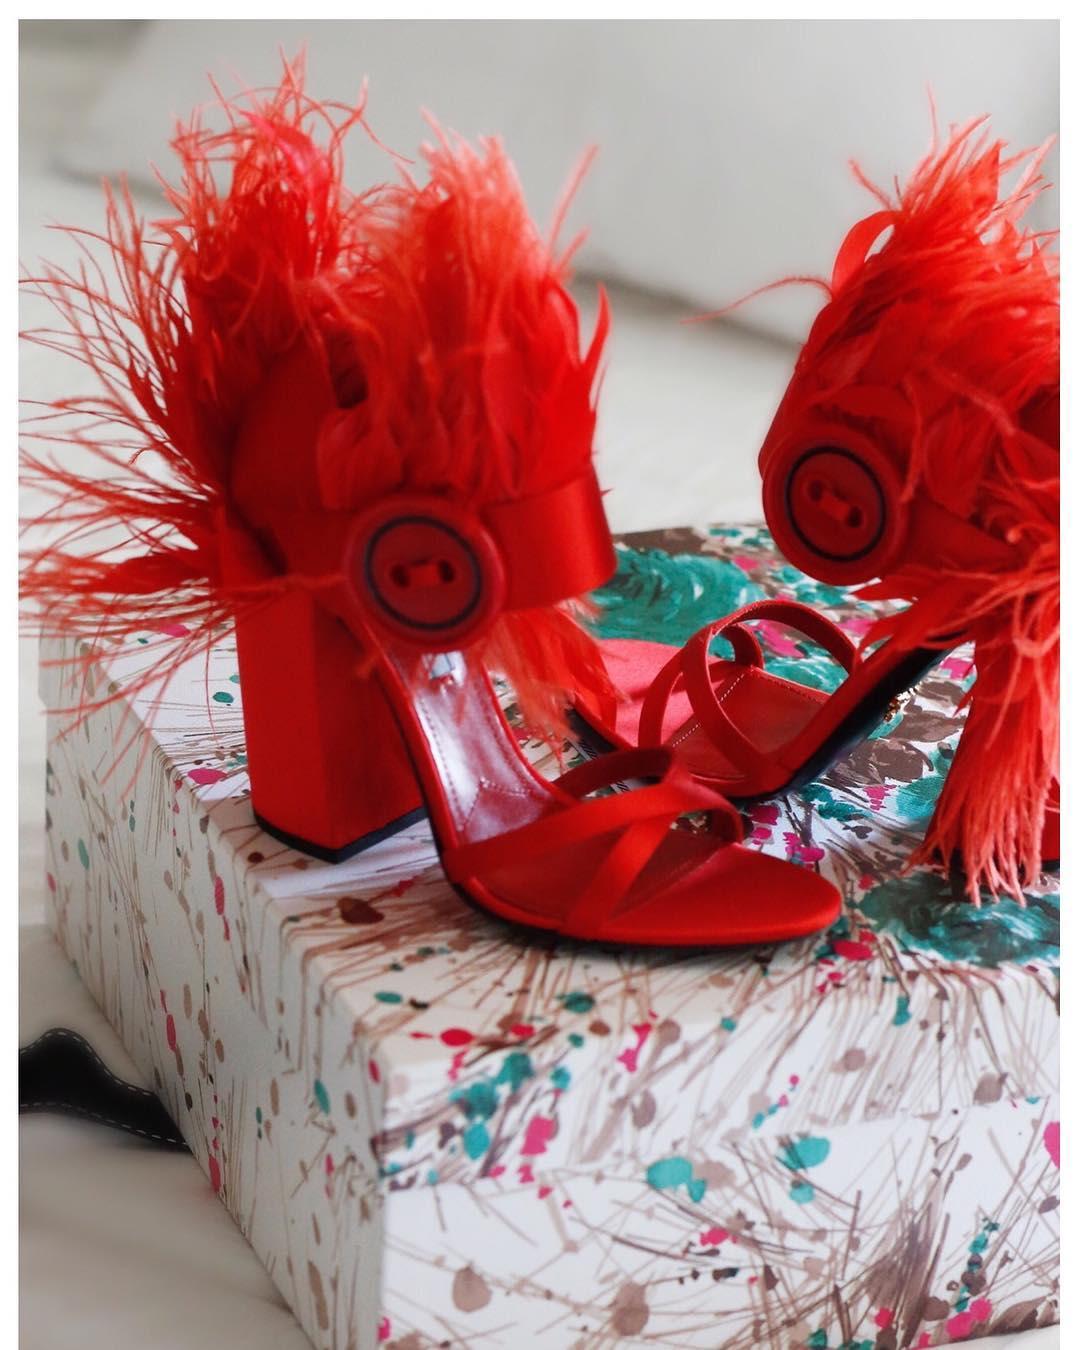 how to wear red stella uzo jadore fashion prada